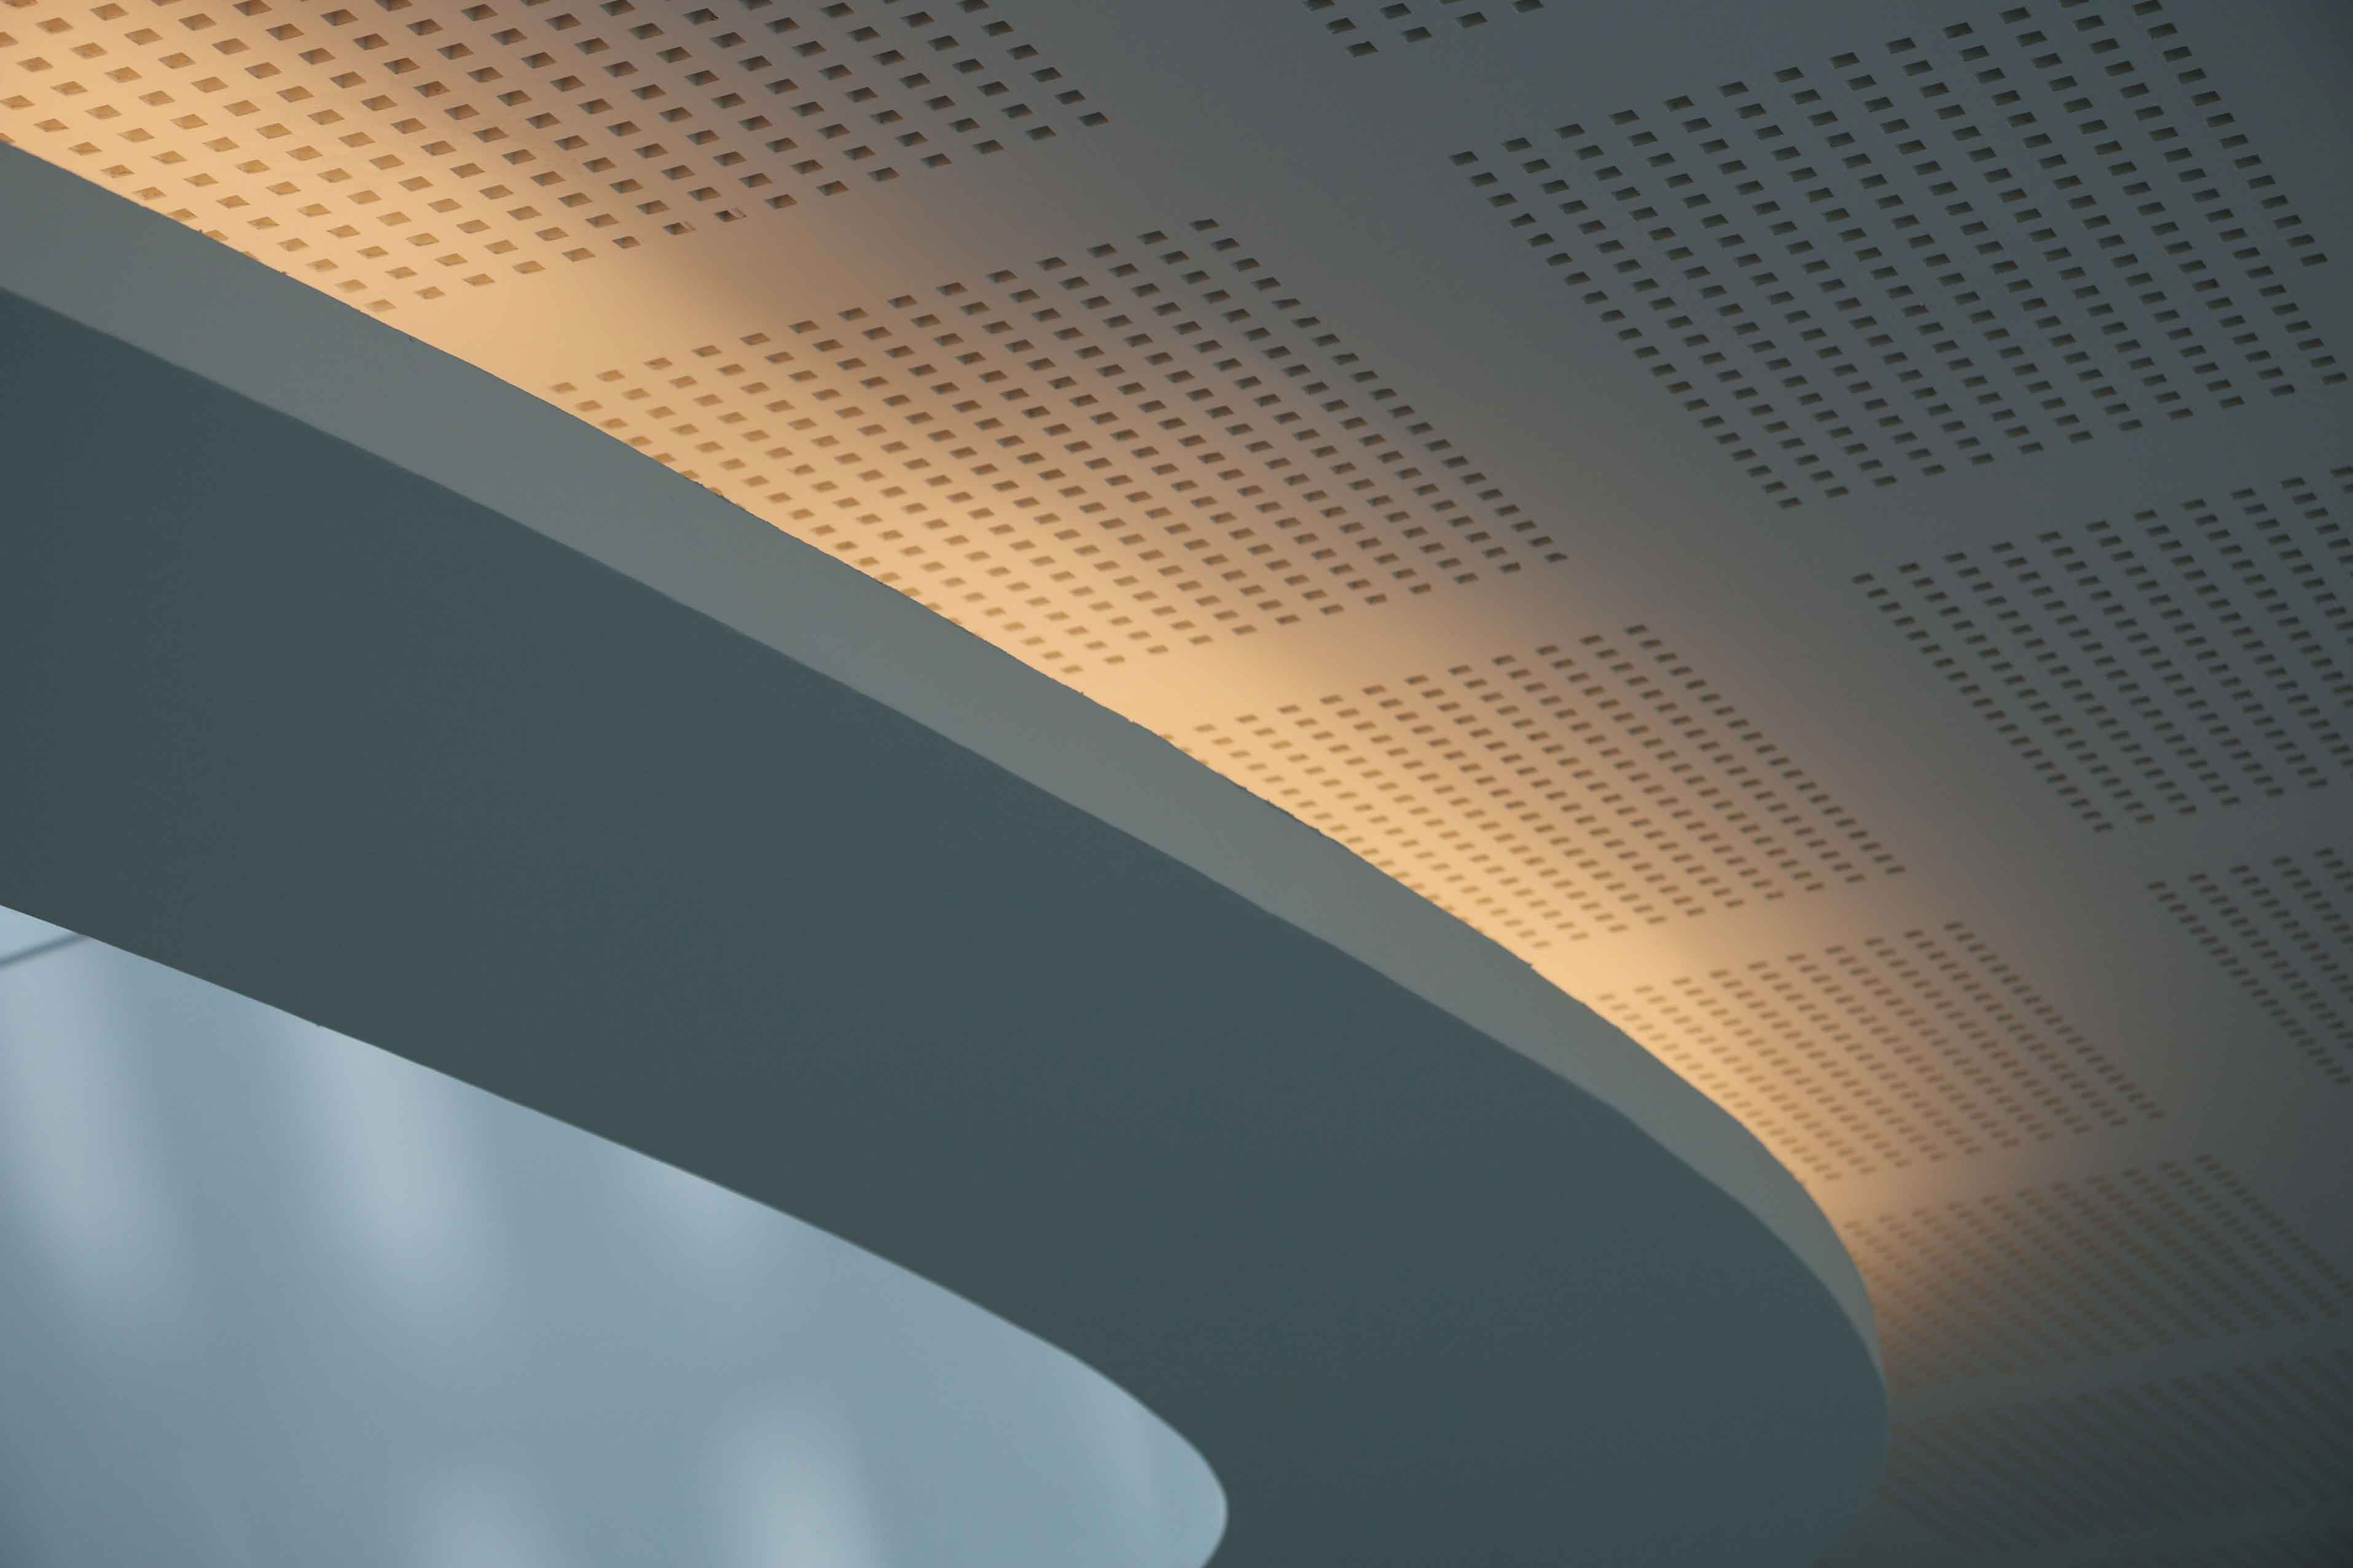 Zoom Gorge Lumineuse Silvae Plafonds Decoratifs Acoustiques Langlois Sobreti Idf 1326